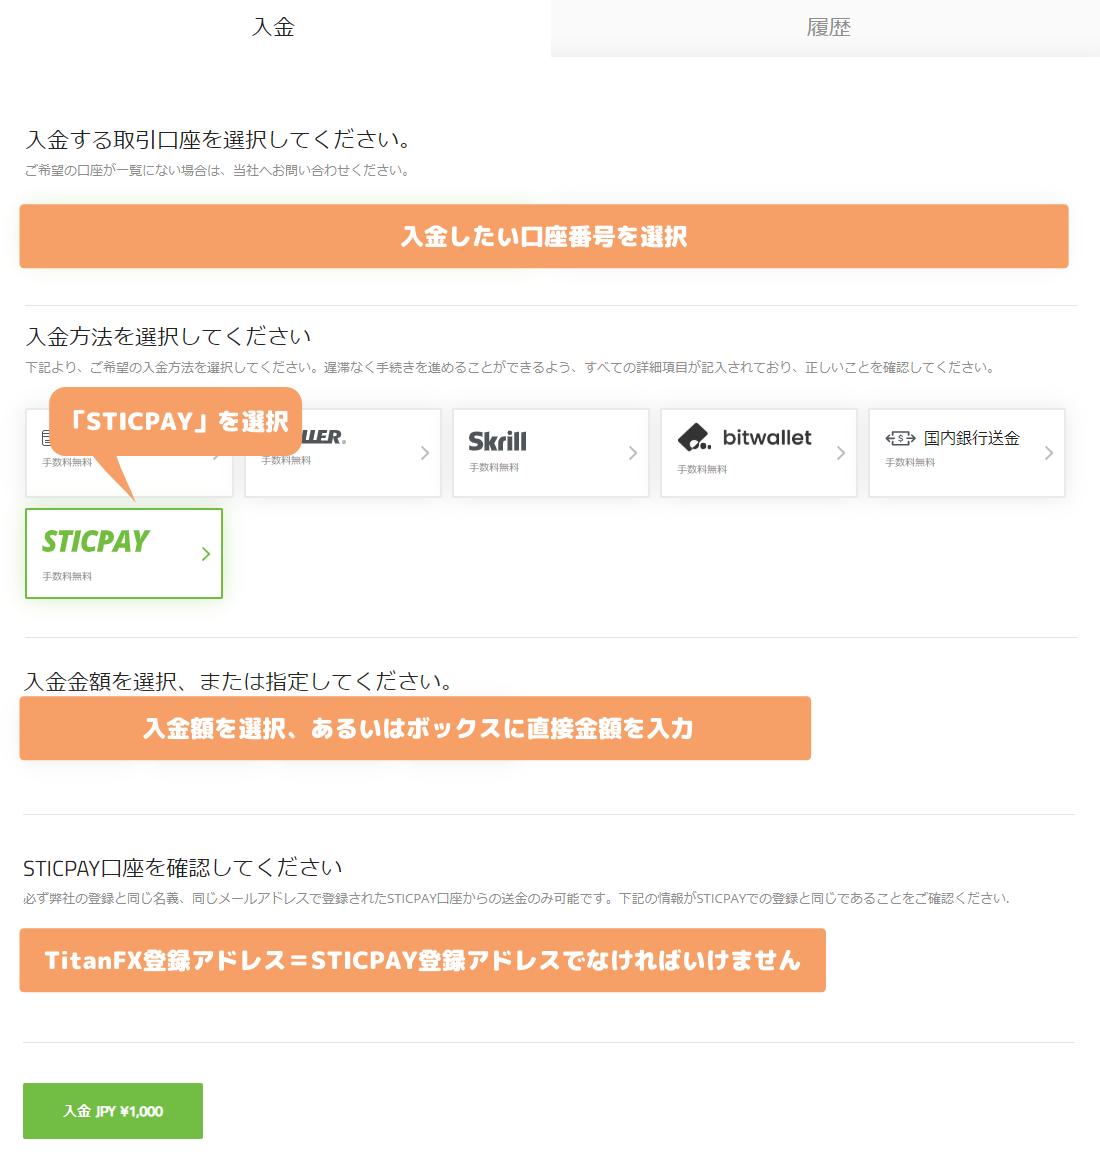 TitanFXのSTICPAY入金手続き画面